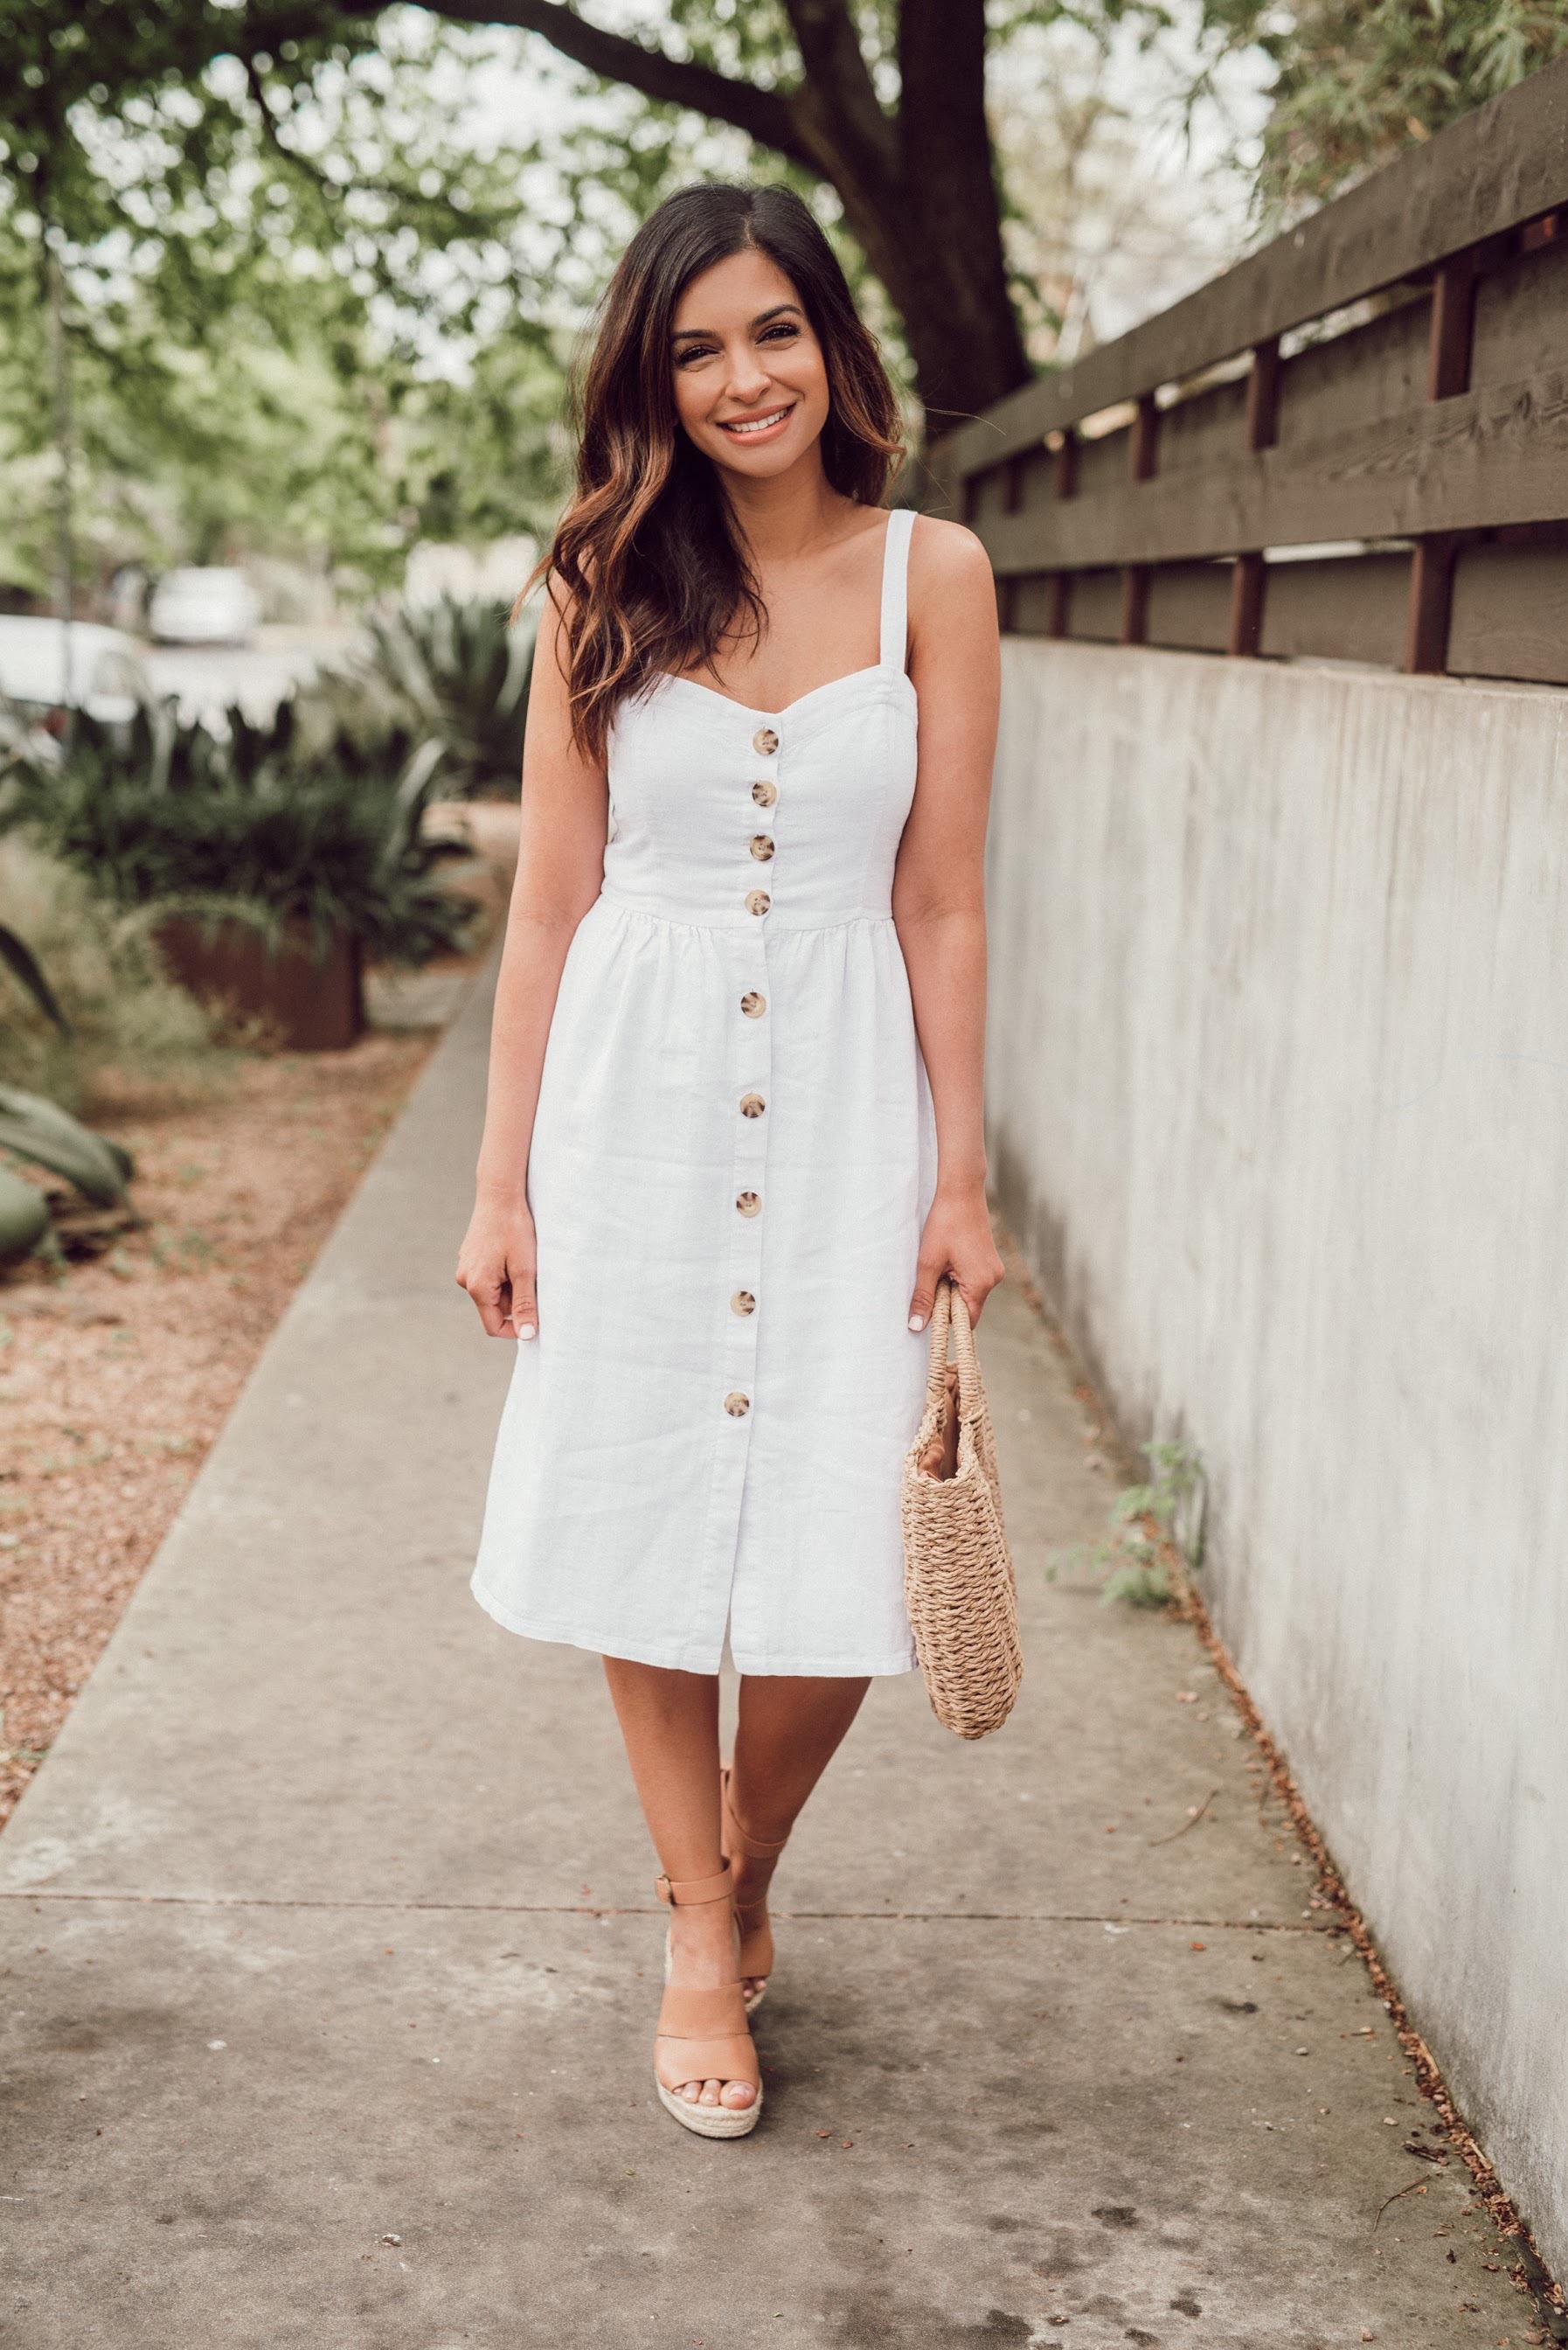 Abercrombie Dress.JPG